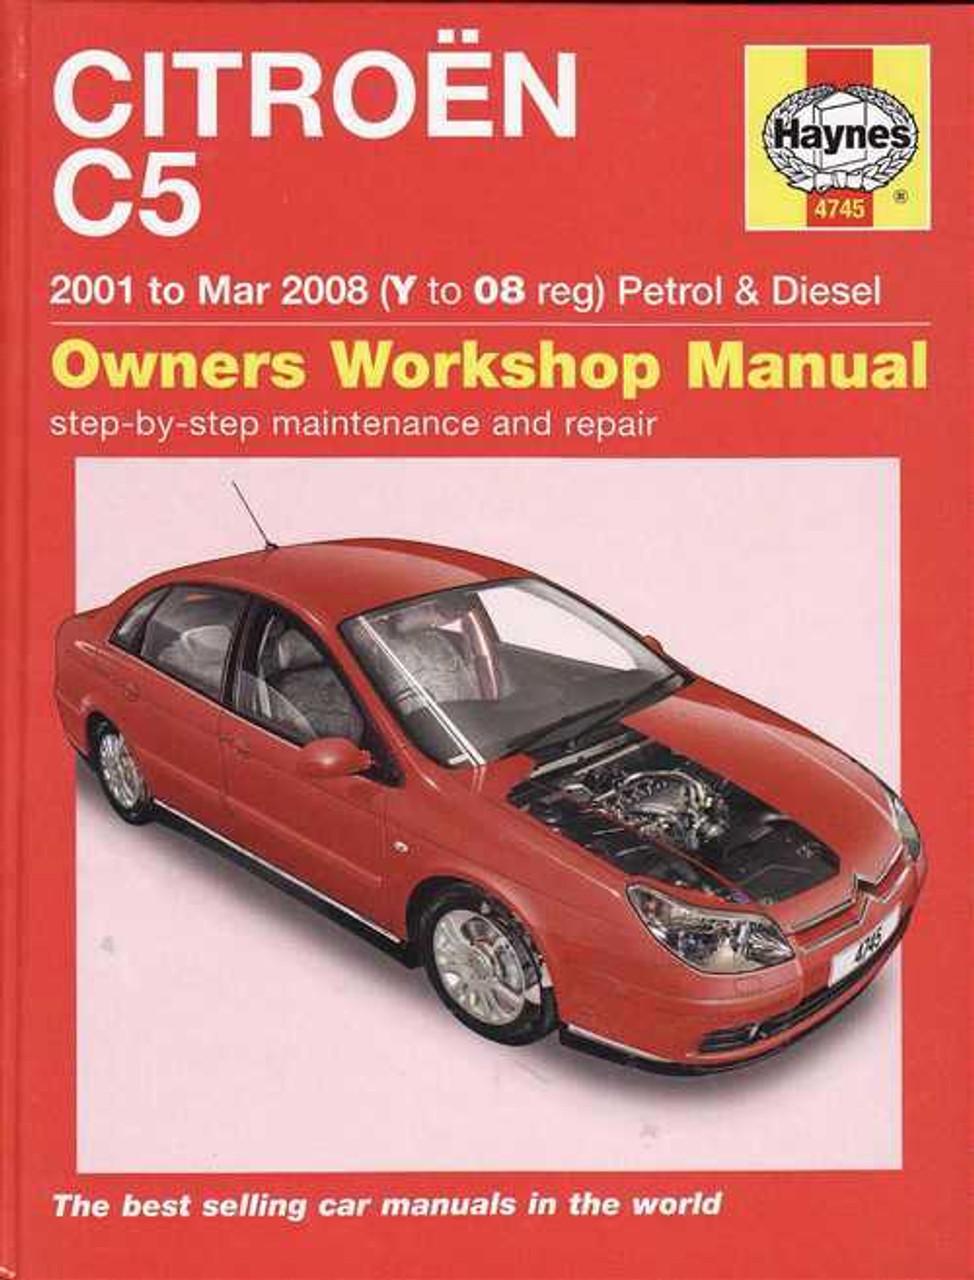 user manual citroen c5 daily instruction manual guides u2022 rh testingwordpress co Citroen C3 1.4 HDI Citroen C3 Interior